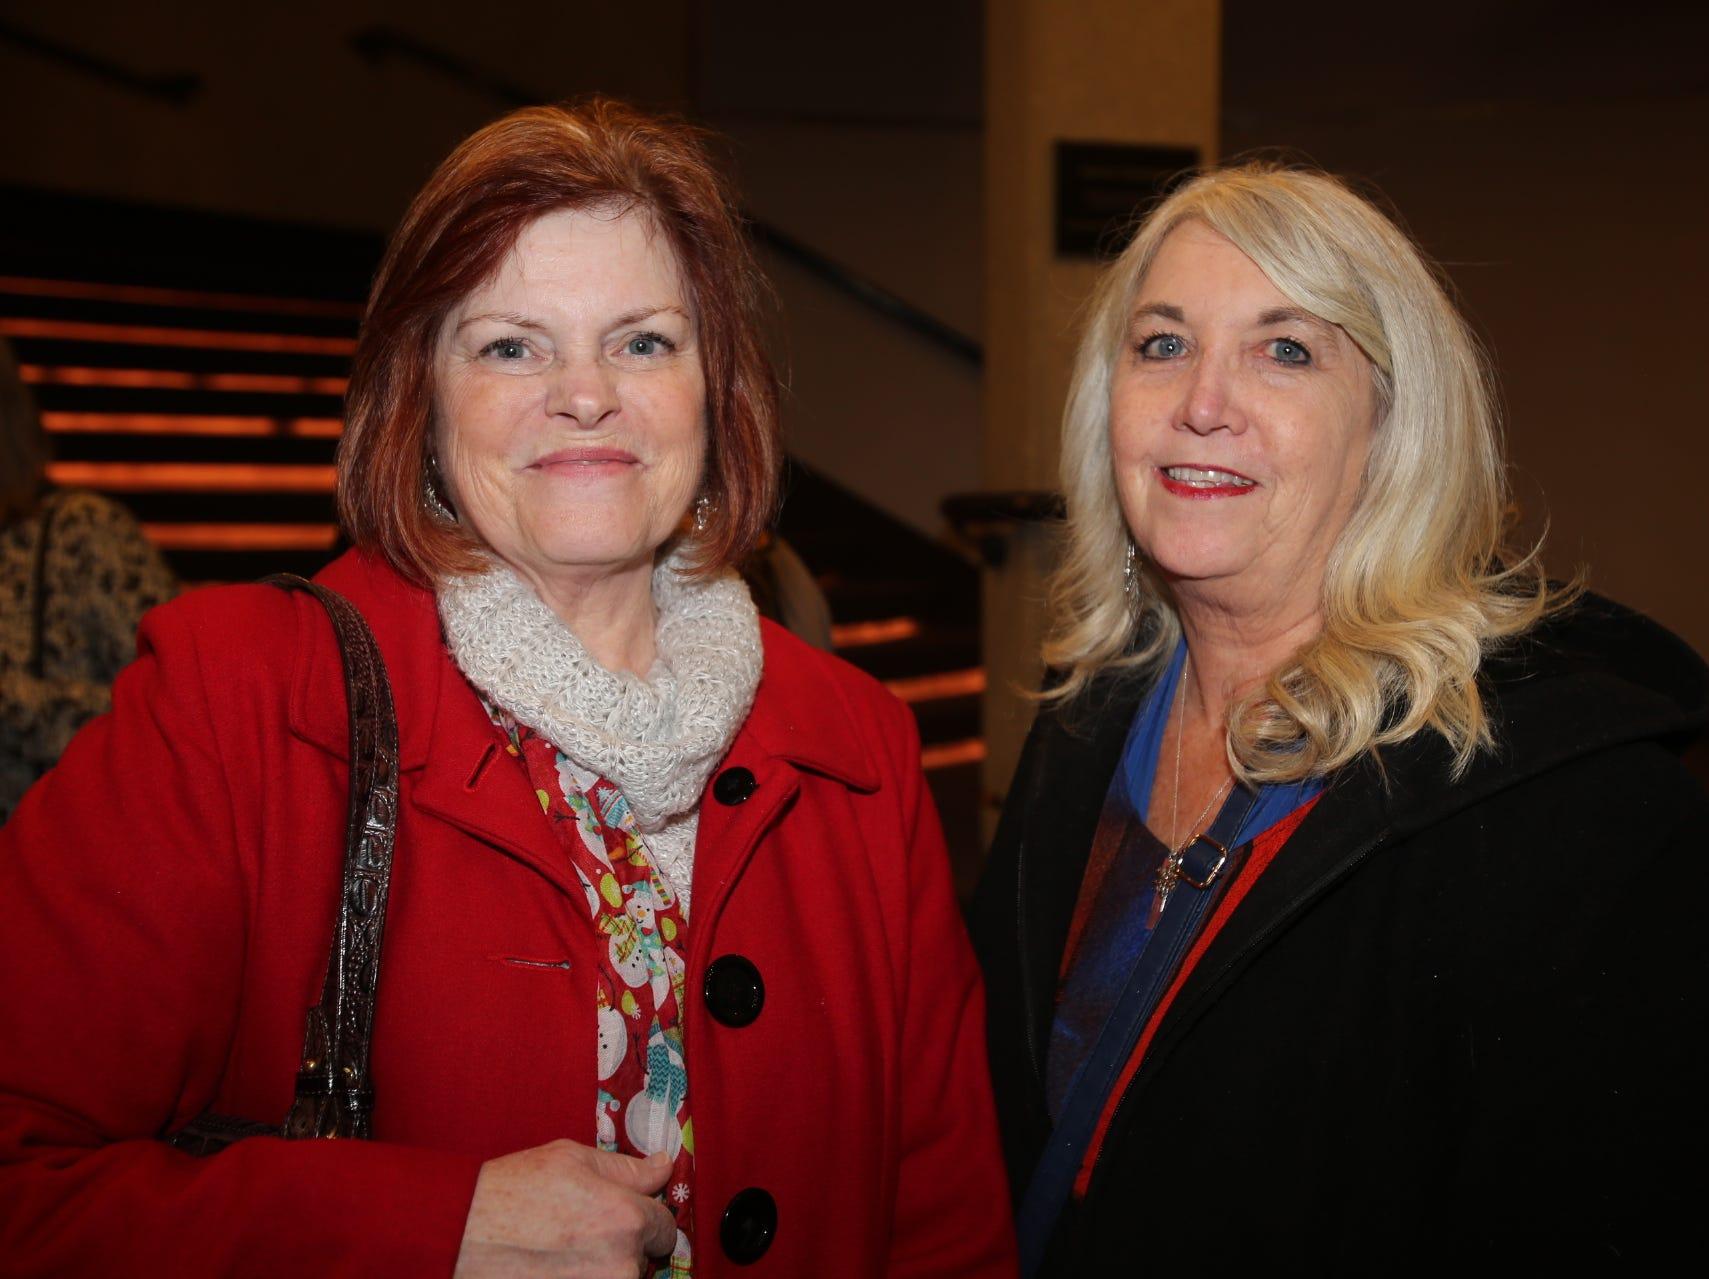 Peggy Horn and Jill Franck